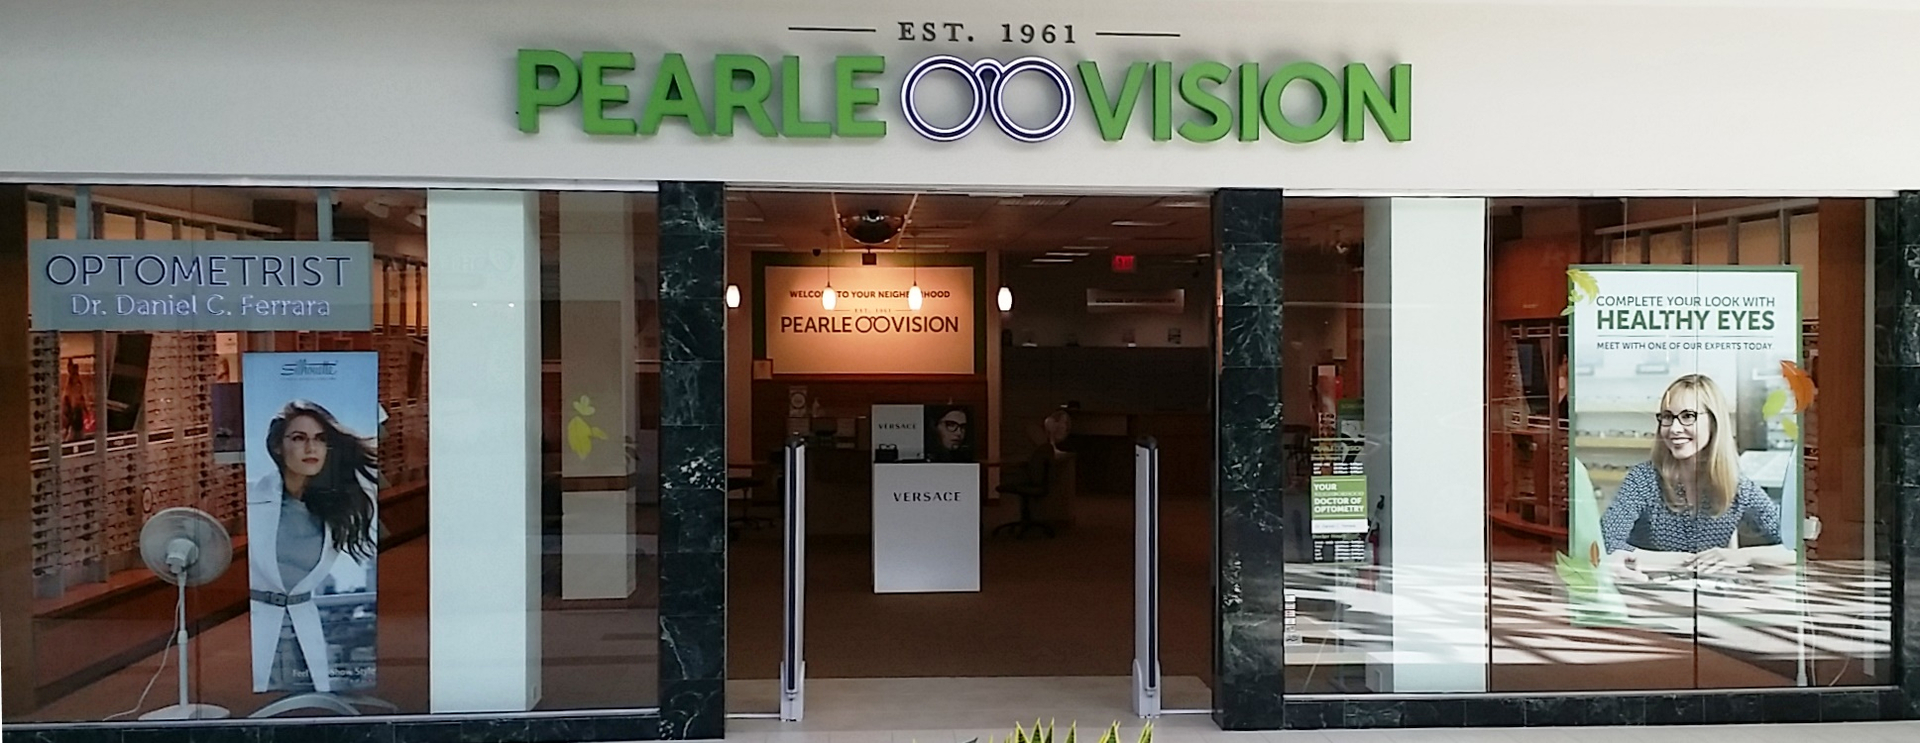 West Michigan Eye Care